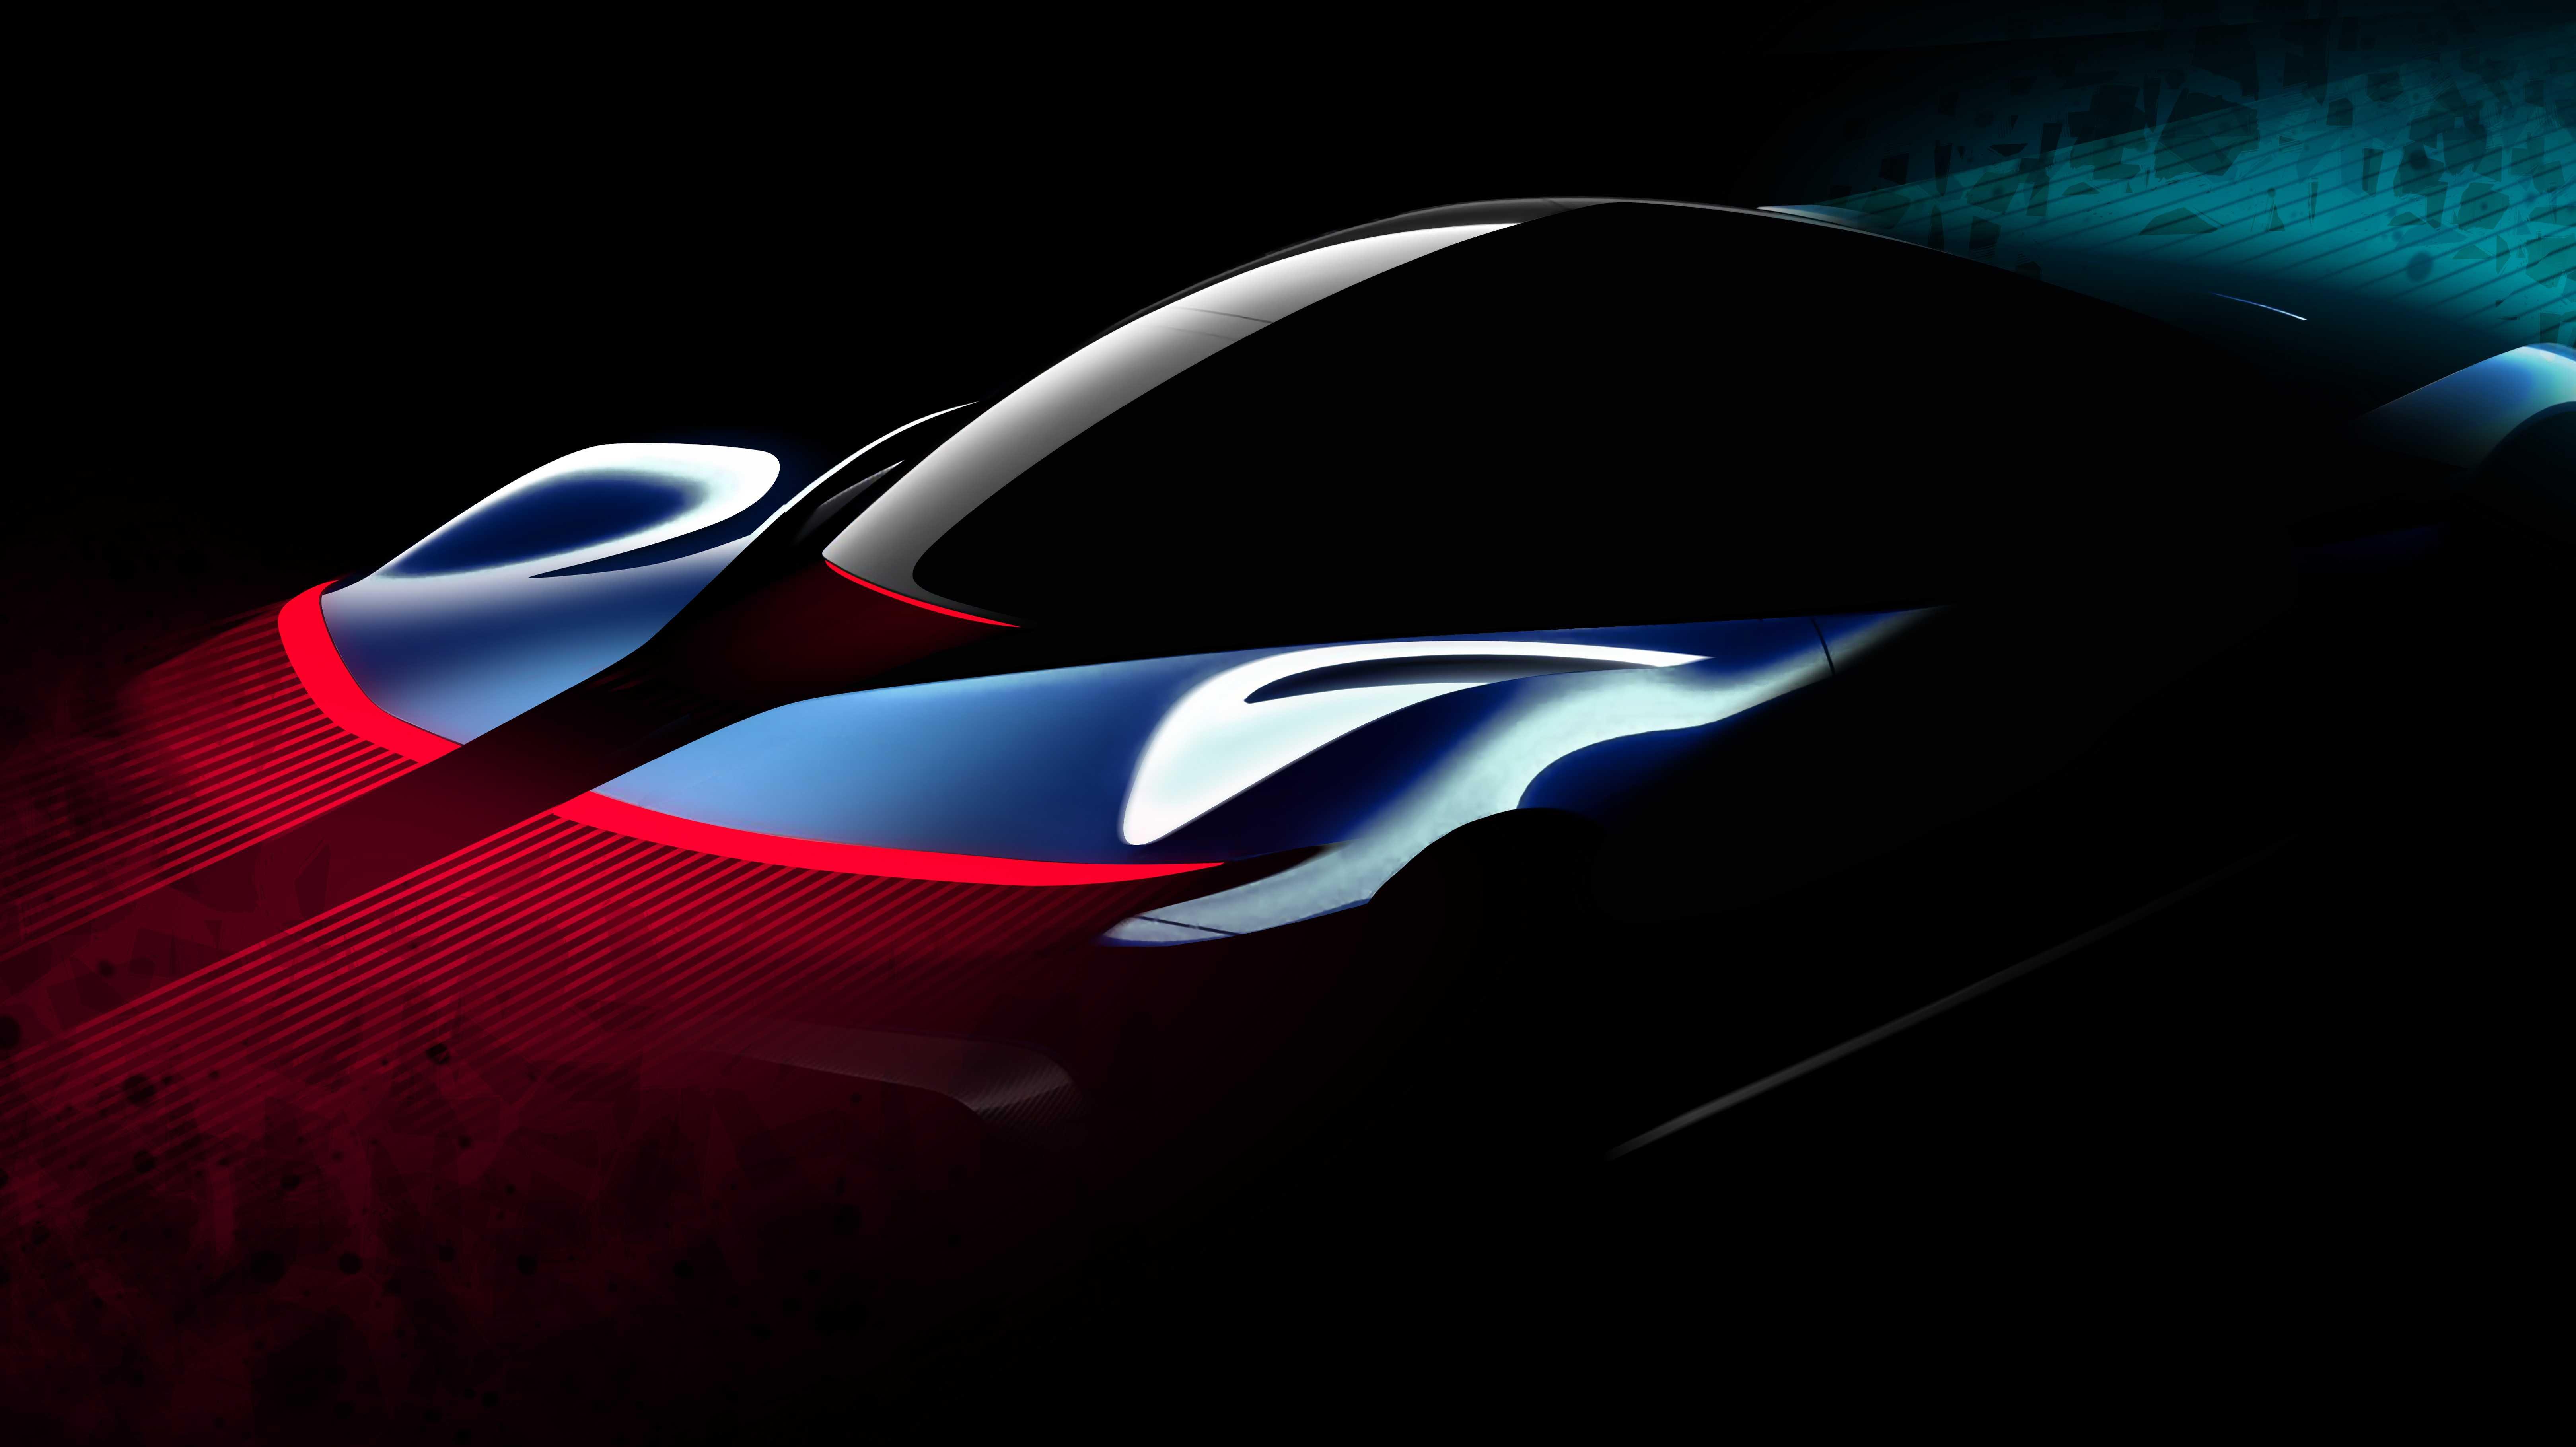 Elektrosportwagen Pininfarina PF0 soll bis zu 2,5 Millionen US-Dollar kosten